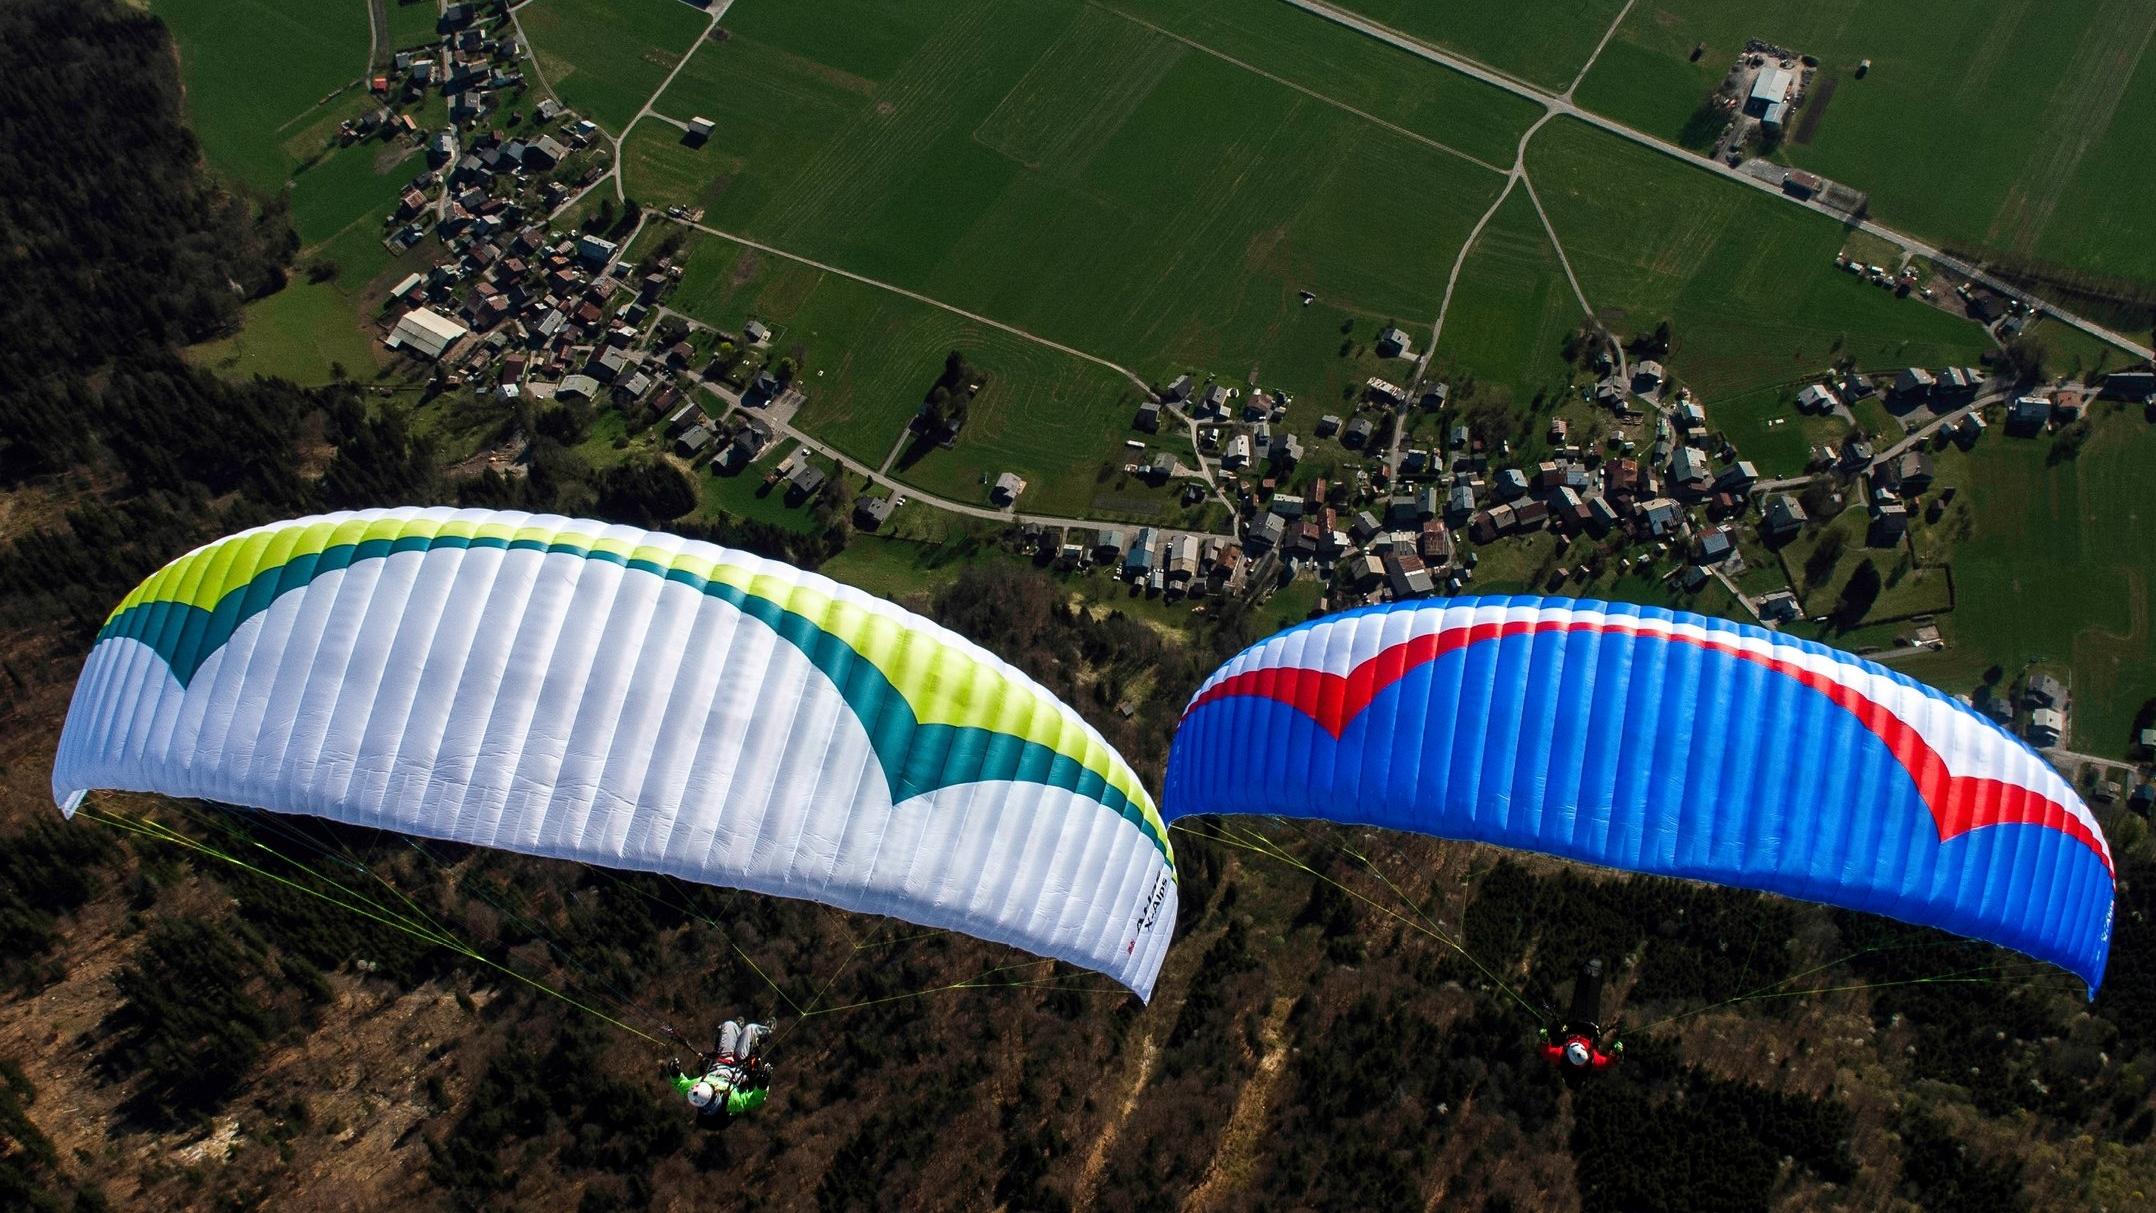 Gin-Gliders-Equipment-Zion-Paragliding.jpg